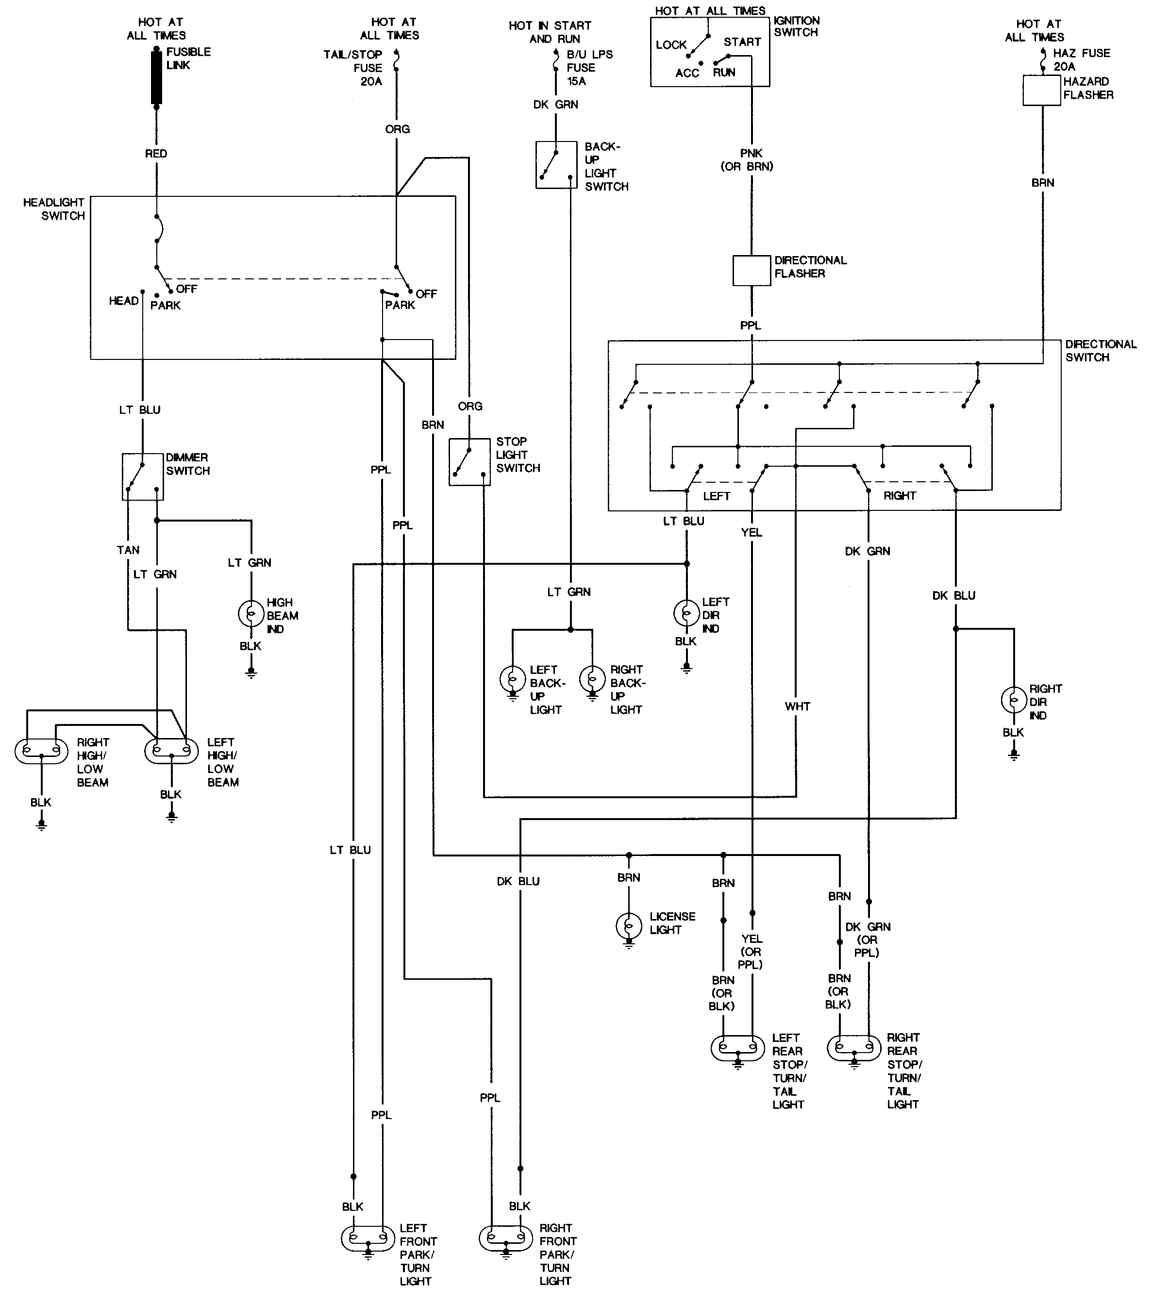 1990 chevy suburban wiring diagram 1978 chevy suburban wiring diagram 1990 chevy suburban wiring diagram #36